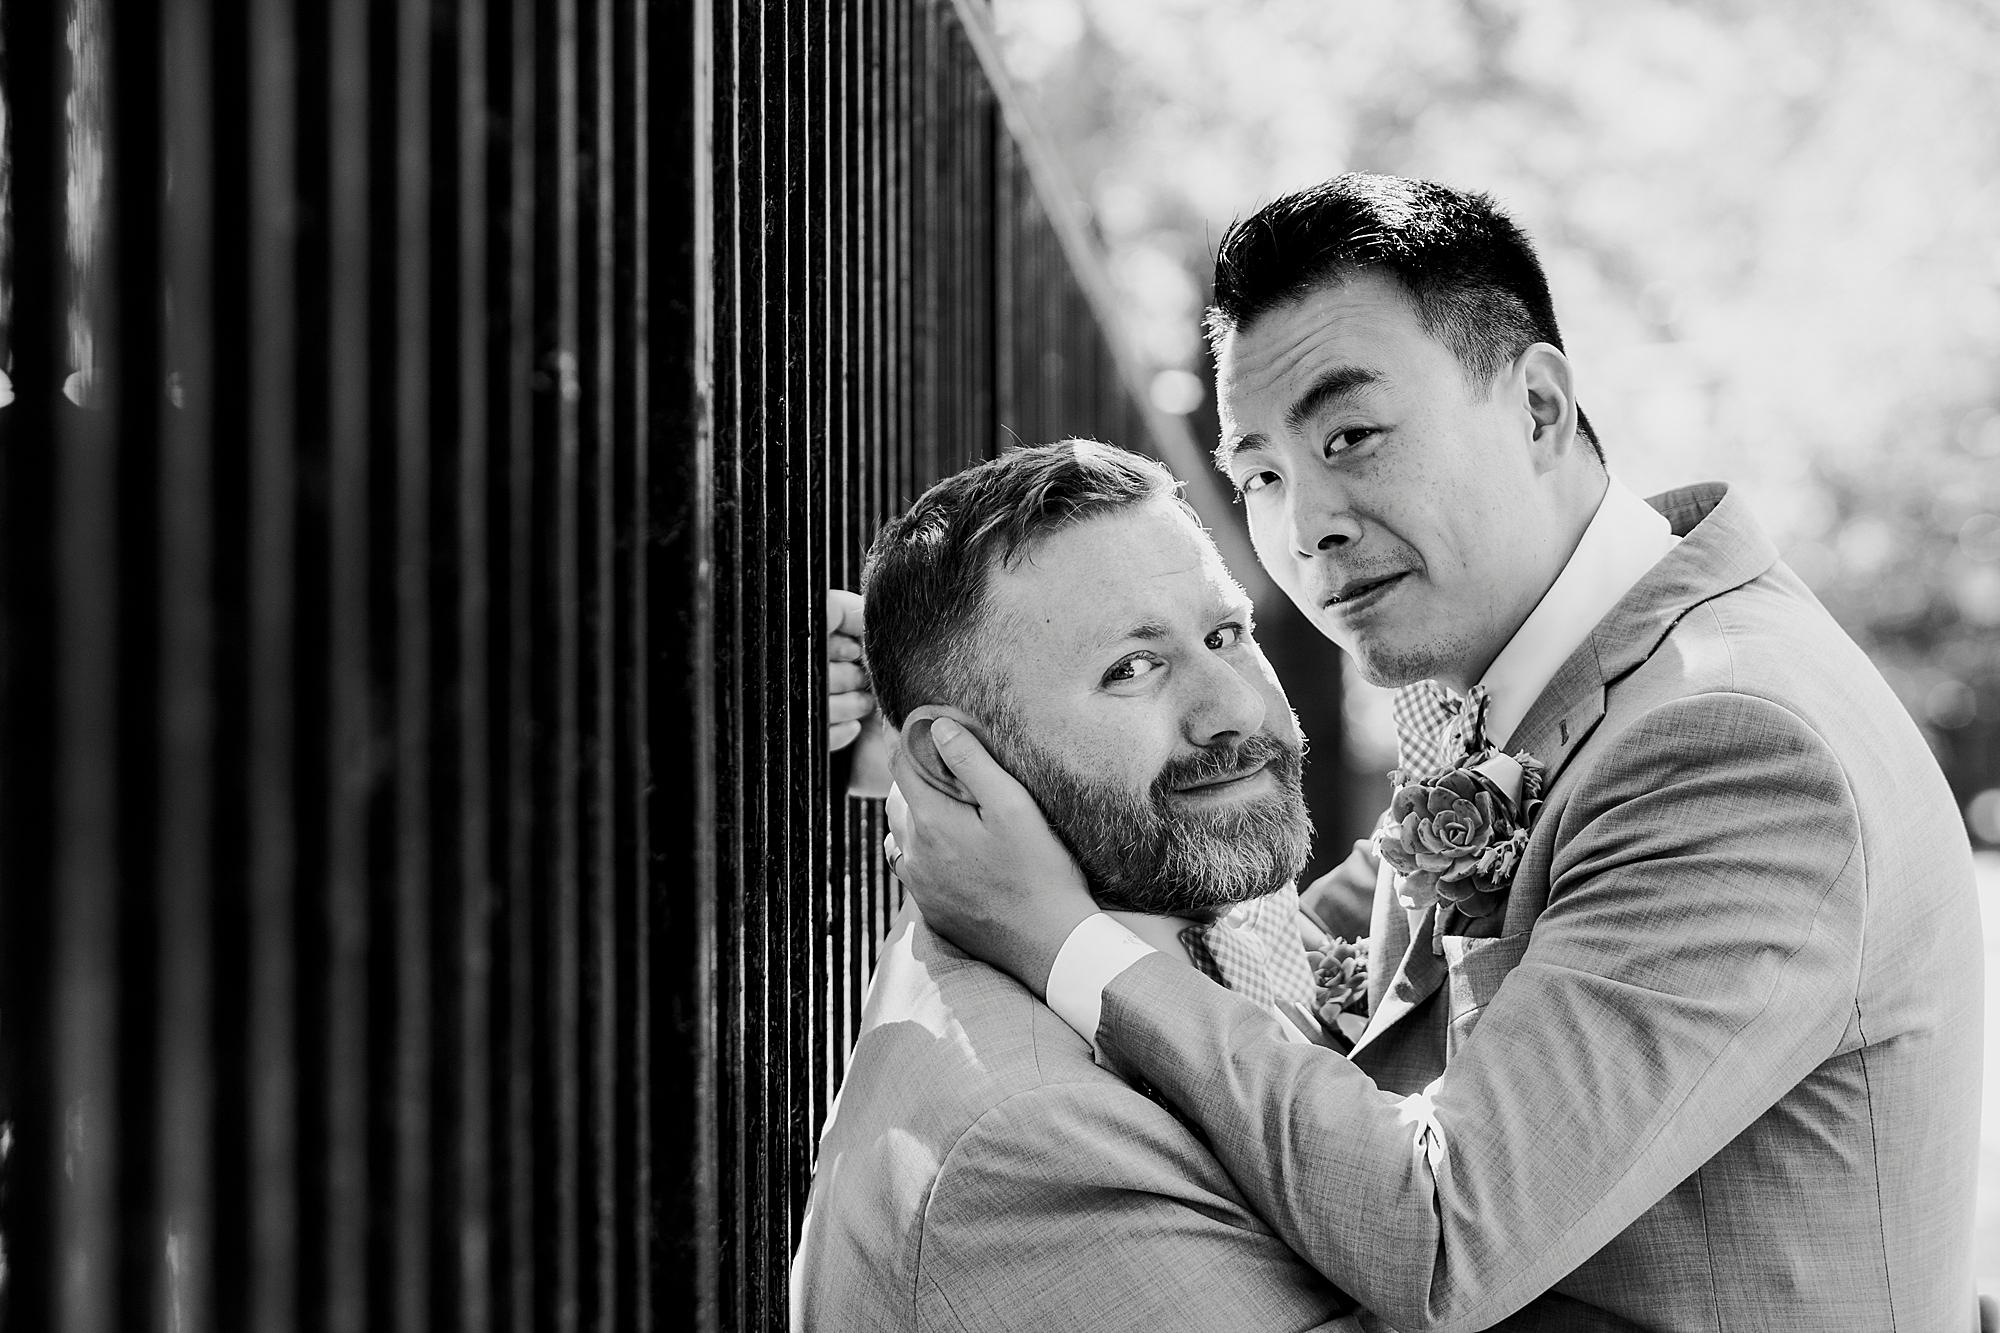 Dan_and_Byron_Love_by_Joe_Mac_Philadelphia_Wedding_LGBTQ_Photography_Gay_Independence_visitor_Center_43.JPG